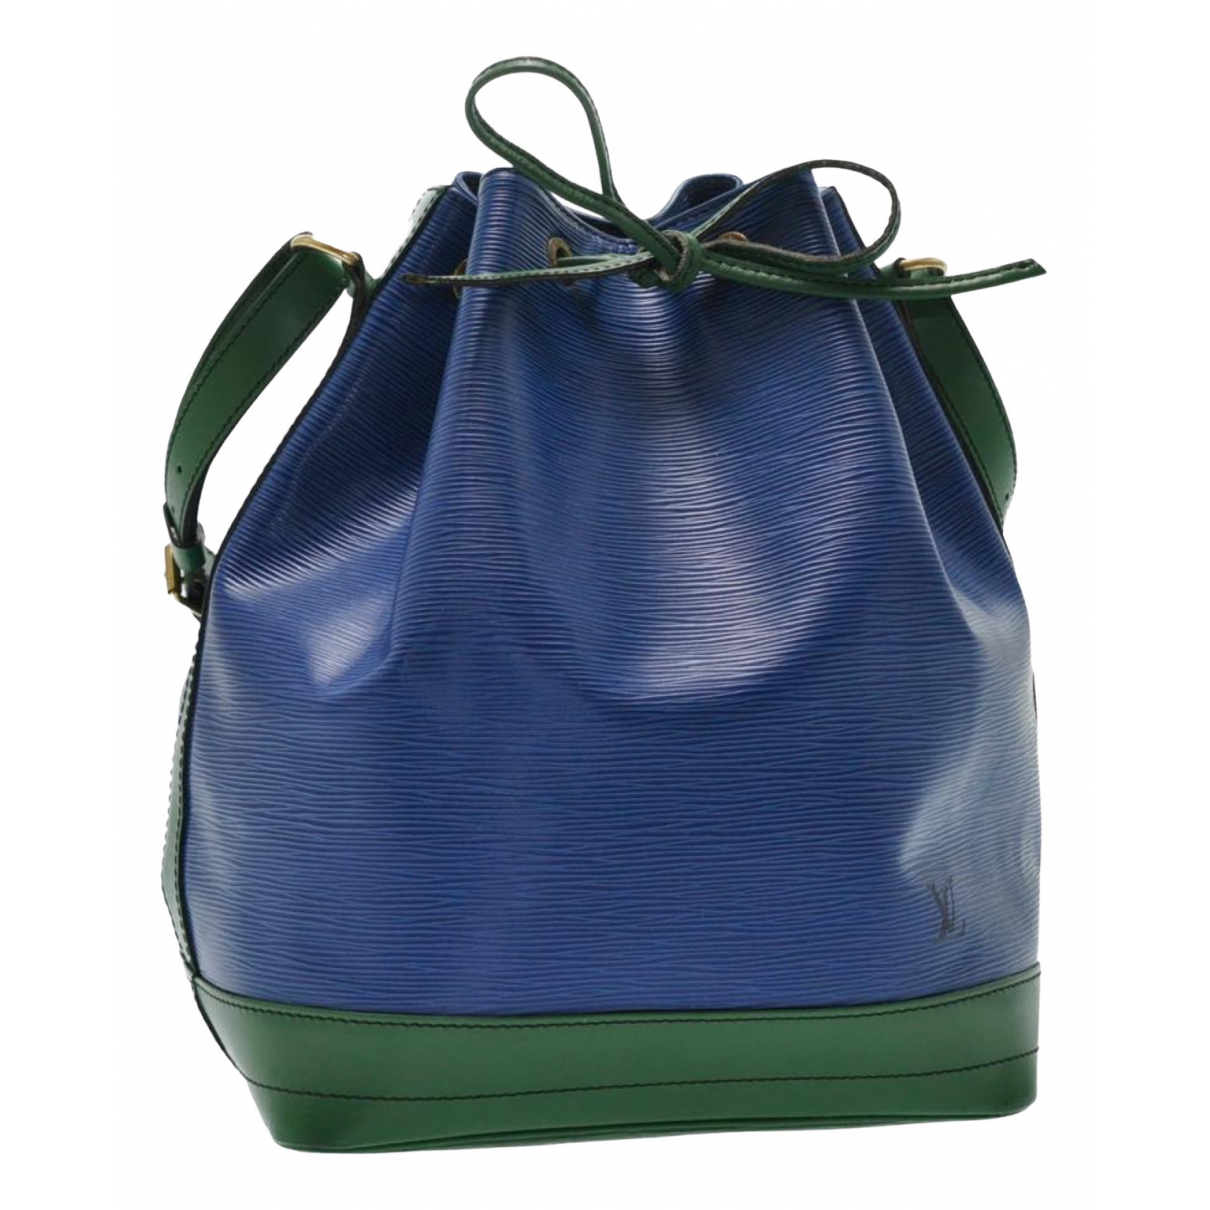 Louis Vuitton - Sac a main Noe pour femme en cuir - bleu